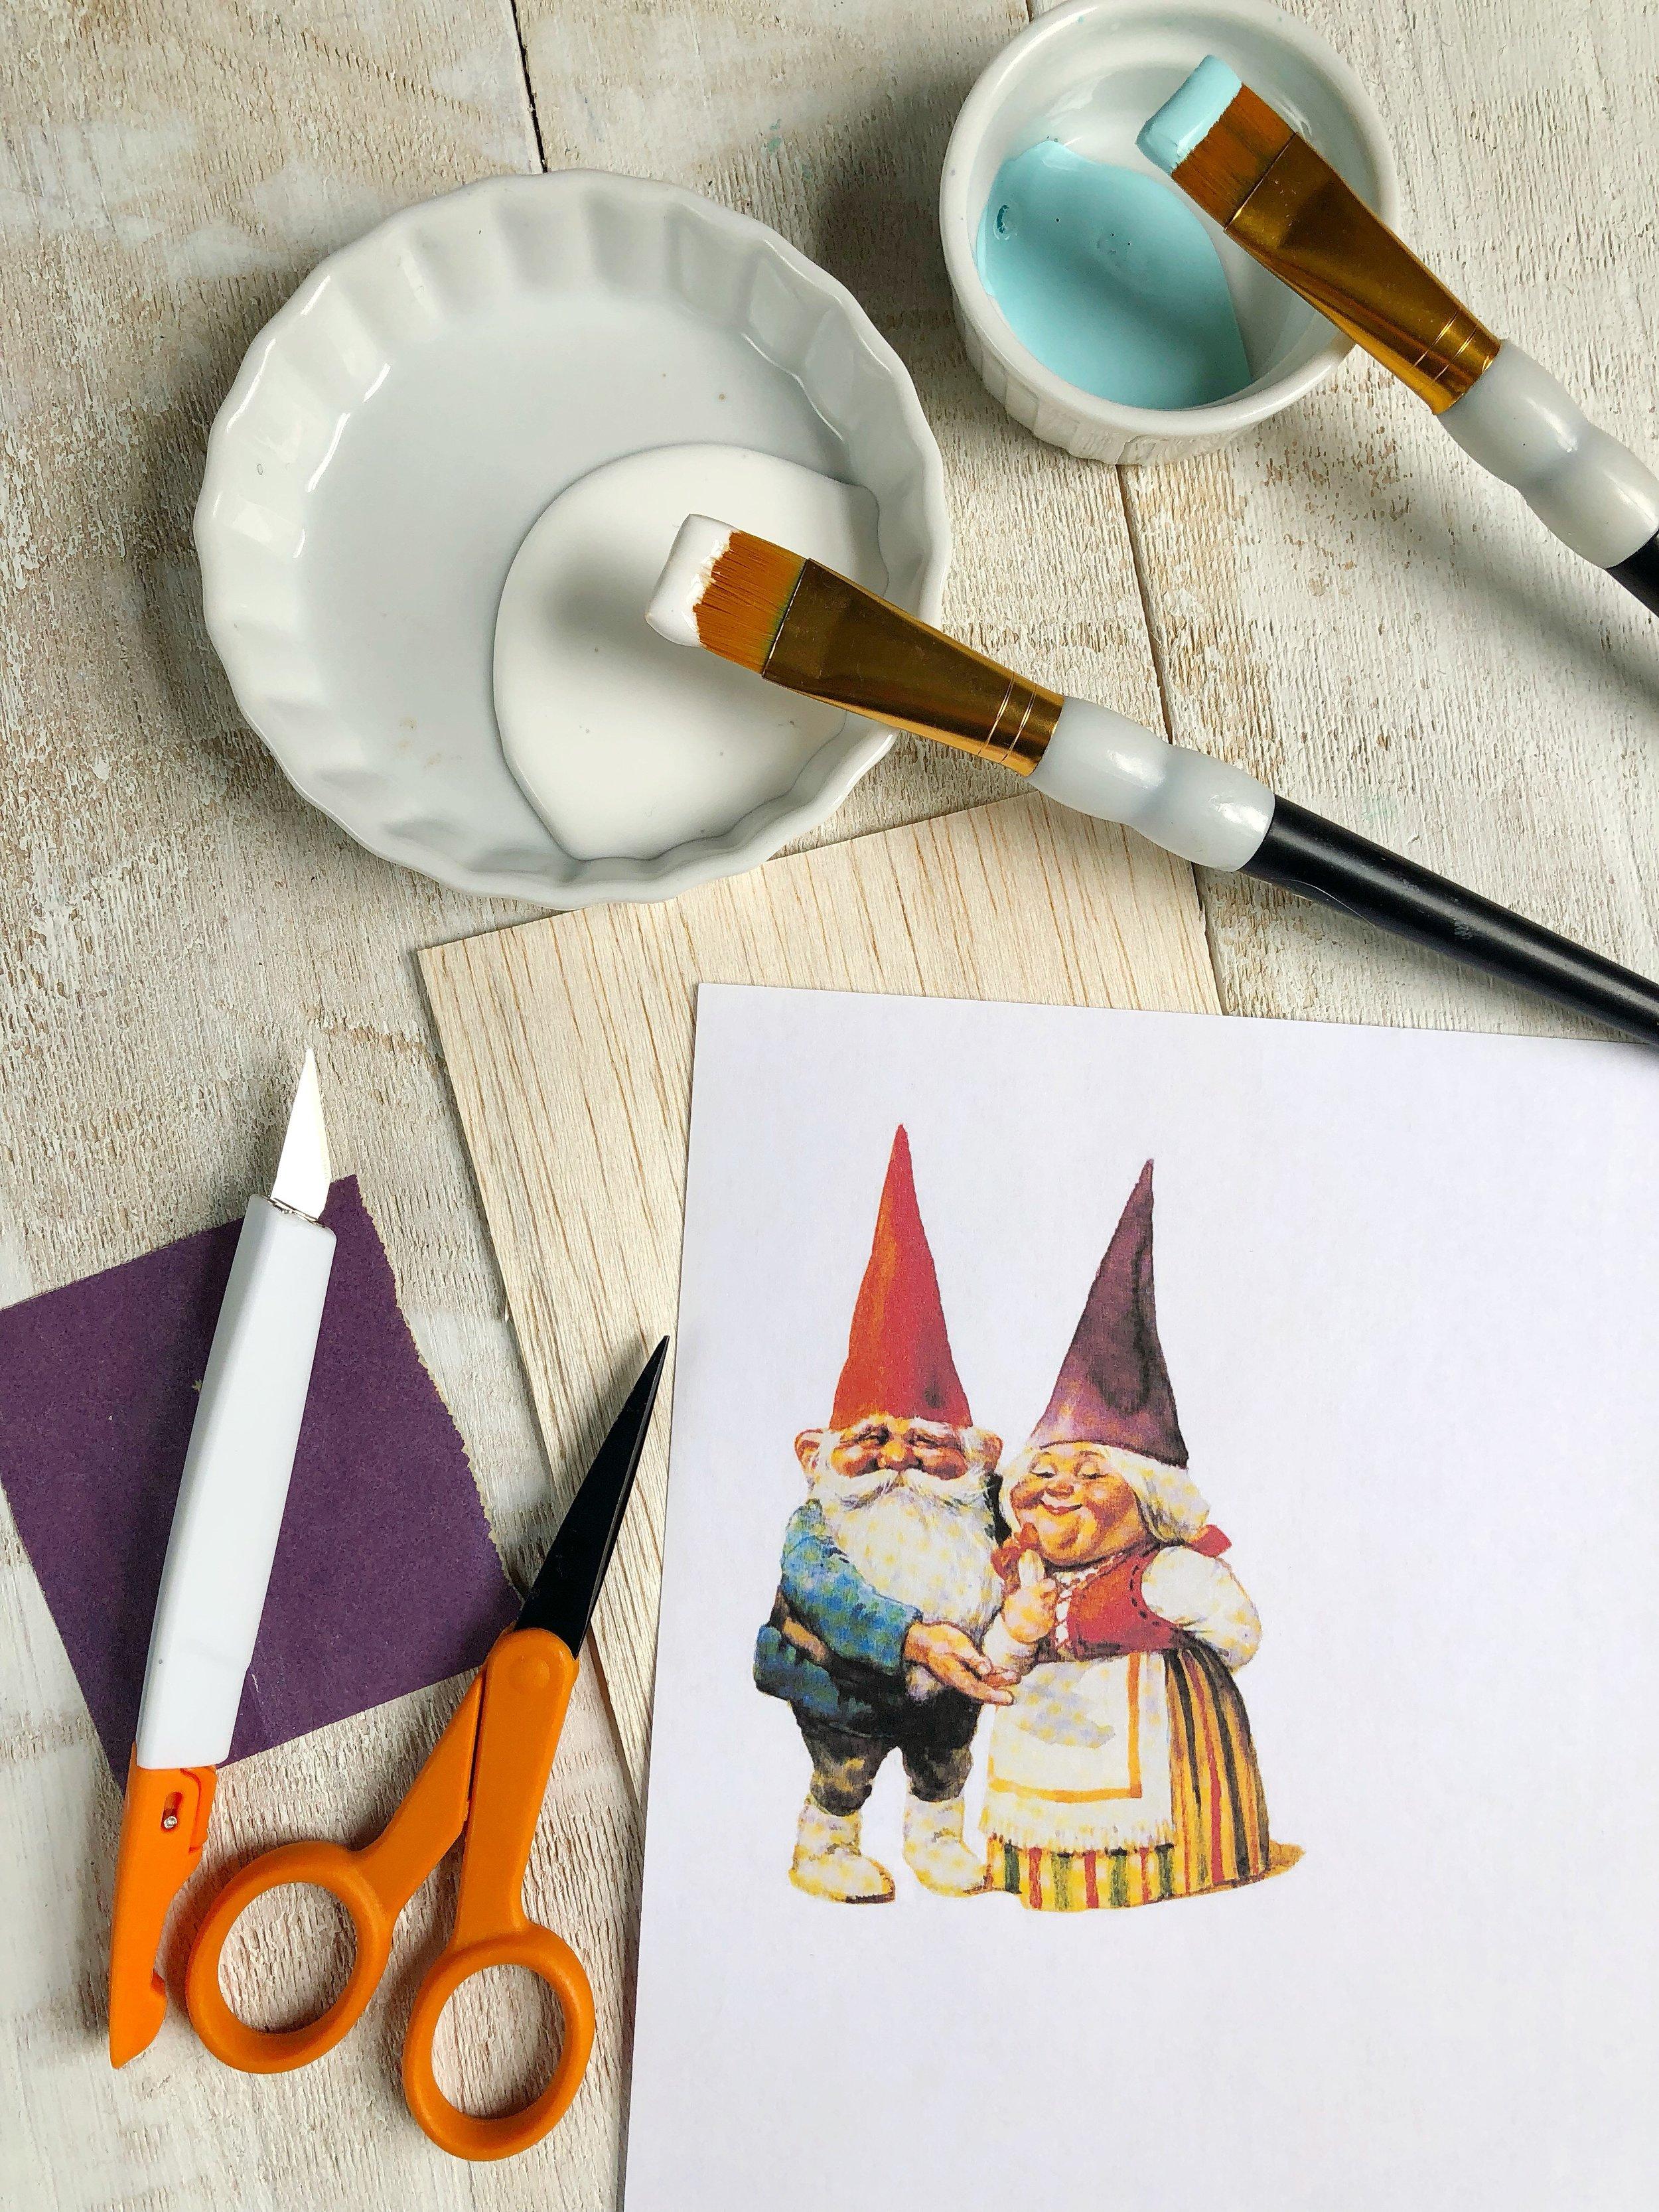 Wooden Gnome Garden Stake DIY   #houseplants #gardengnome #gnomes #indoorplants #indoorgarden #balsawood #plantstake #gardendiy #greenthumb #acrylicpaint #google #googleimages #vintage